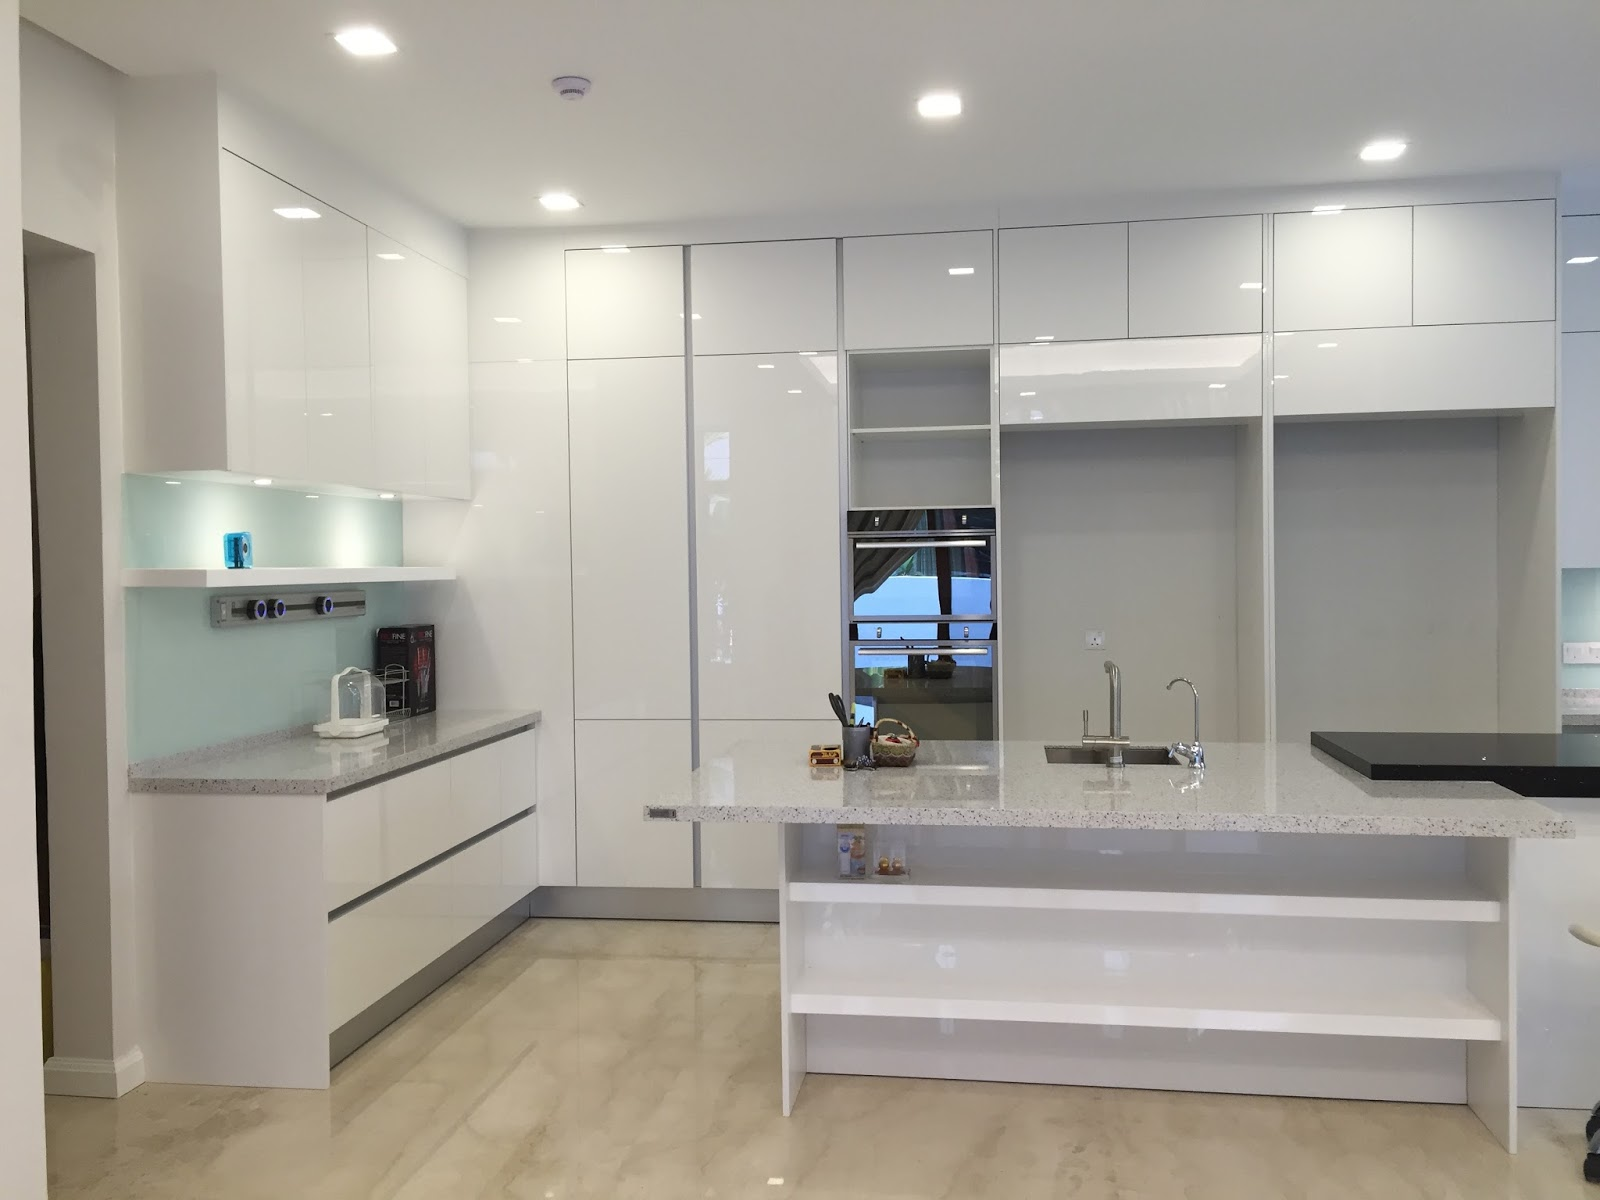 Meridian Interior Design And Kitchen Design In Kuala Lumpur Selangor Malaysia Design For